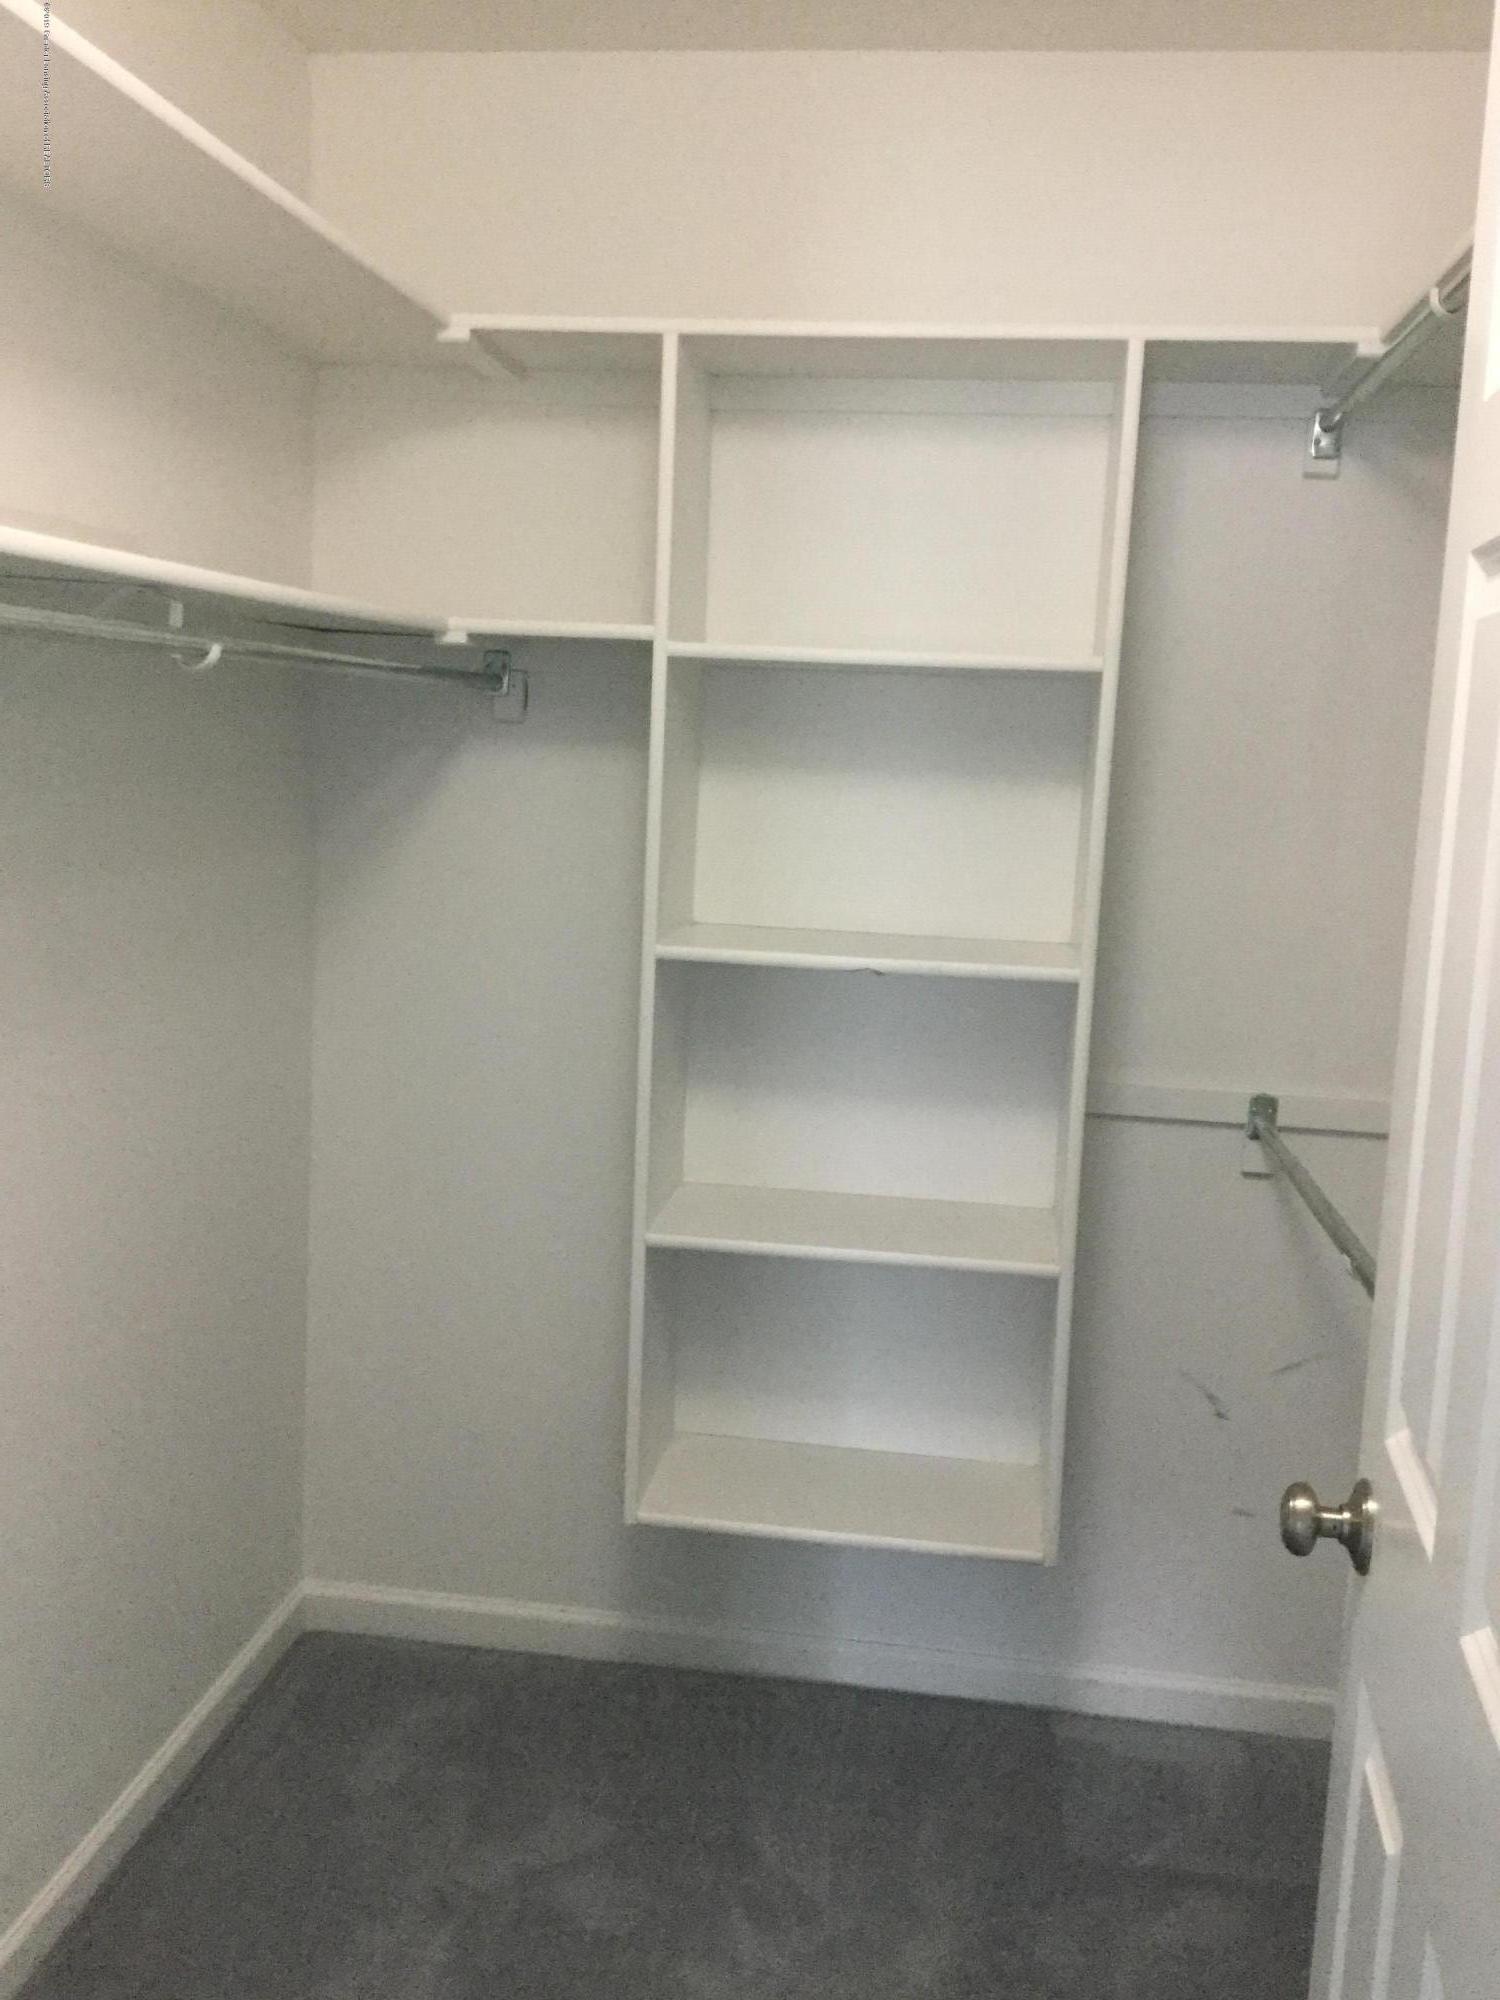 687 Puffin Pl - Master Closet Empty - 15